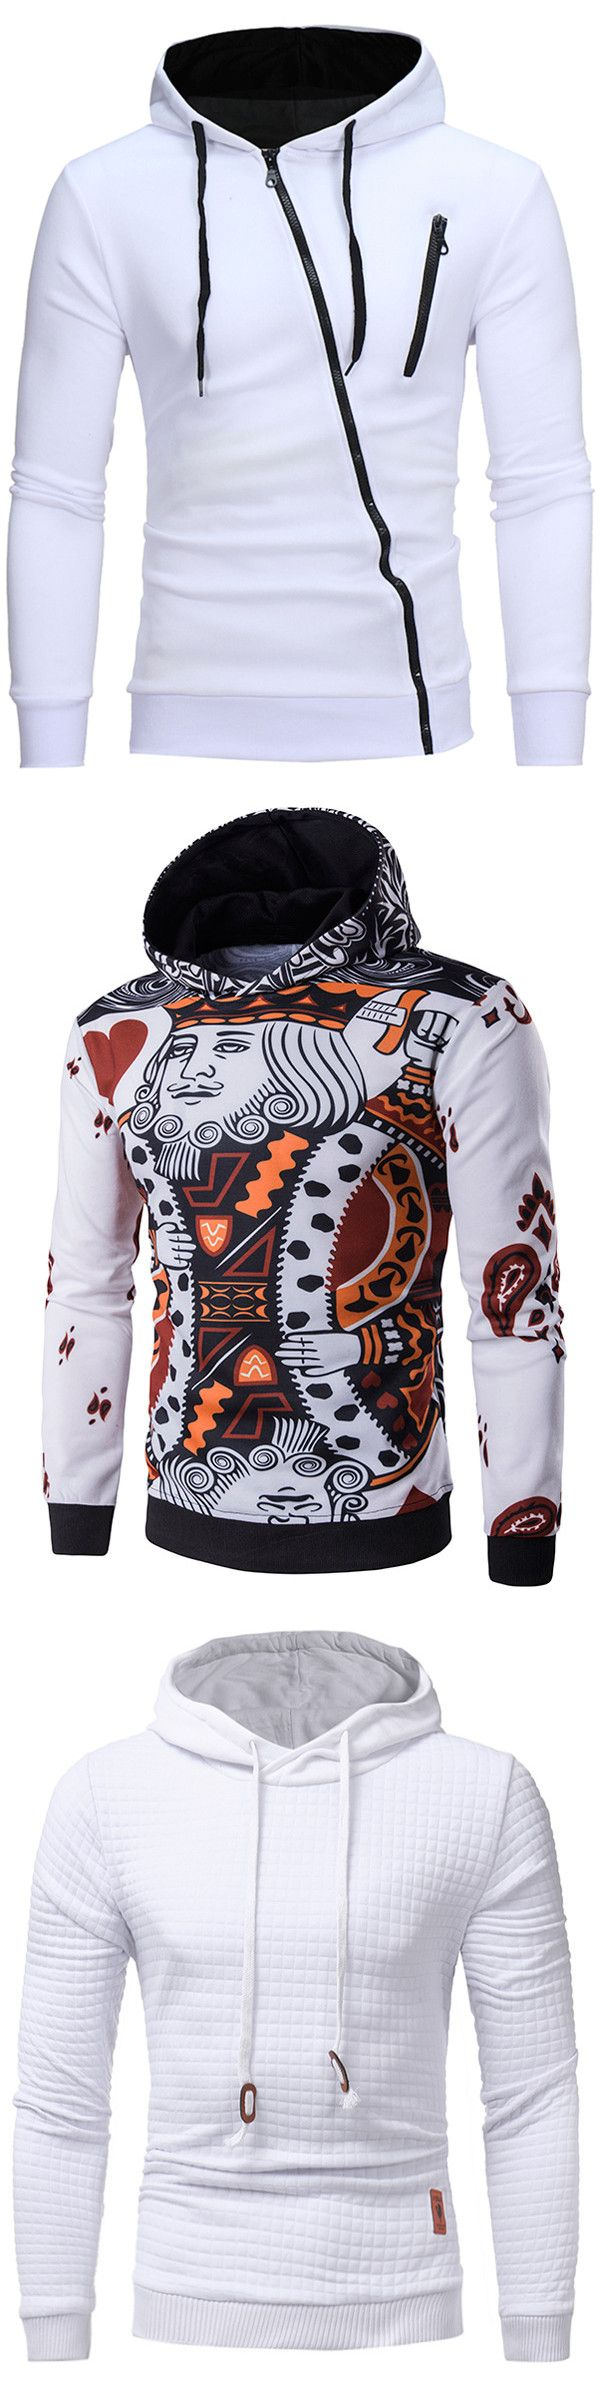 #Mens #Fashion Sweatshirts & Hoodies   Up To 90% OFF   Start From $2.99   Sammydress.com